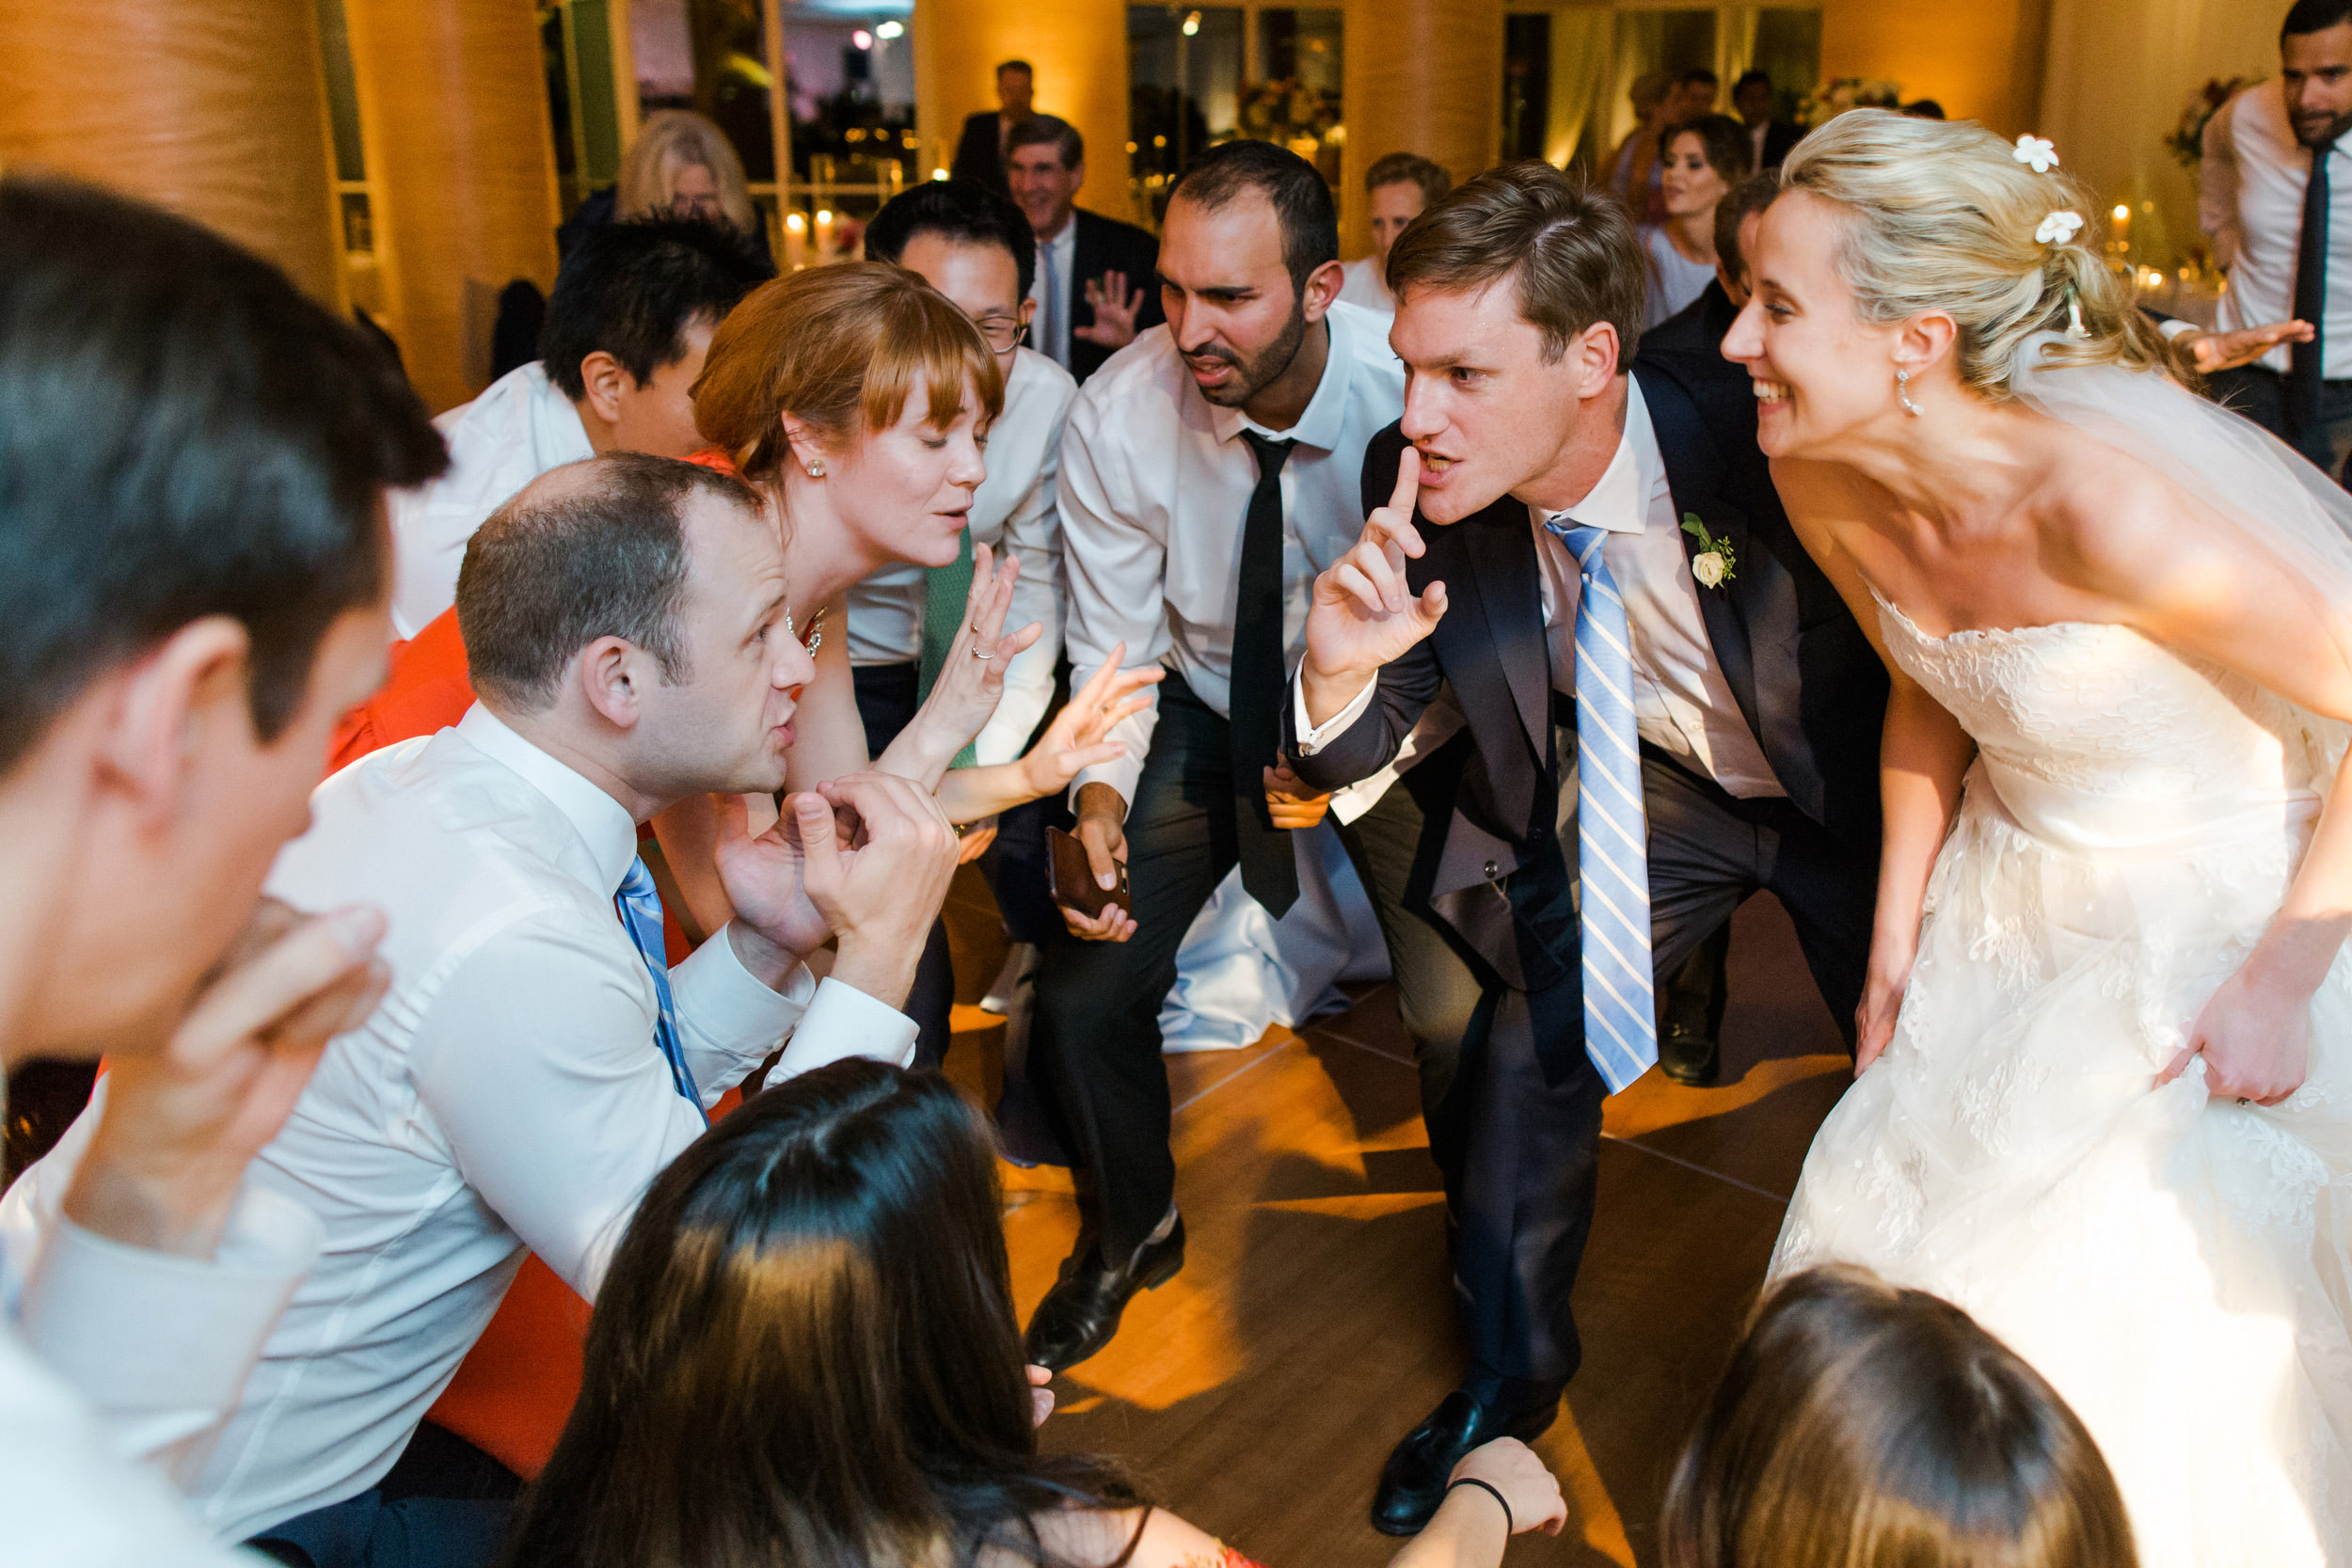 biltmore_santa_barbara_wedding_photos_coral_casino_093.jpg